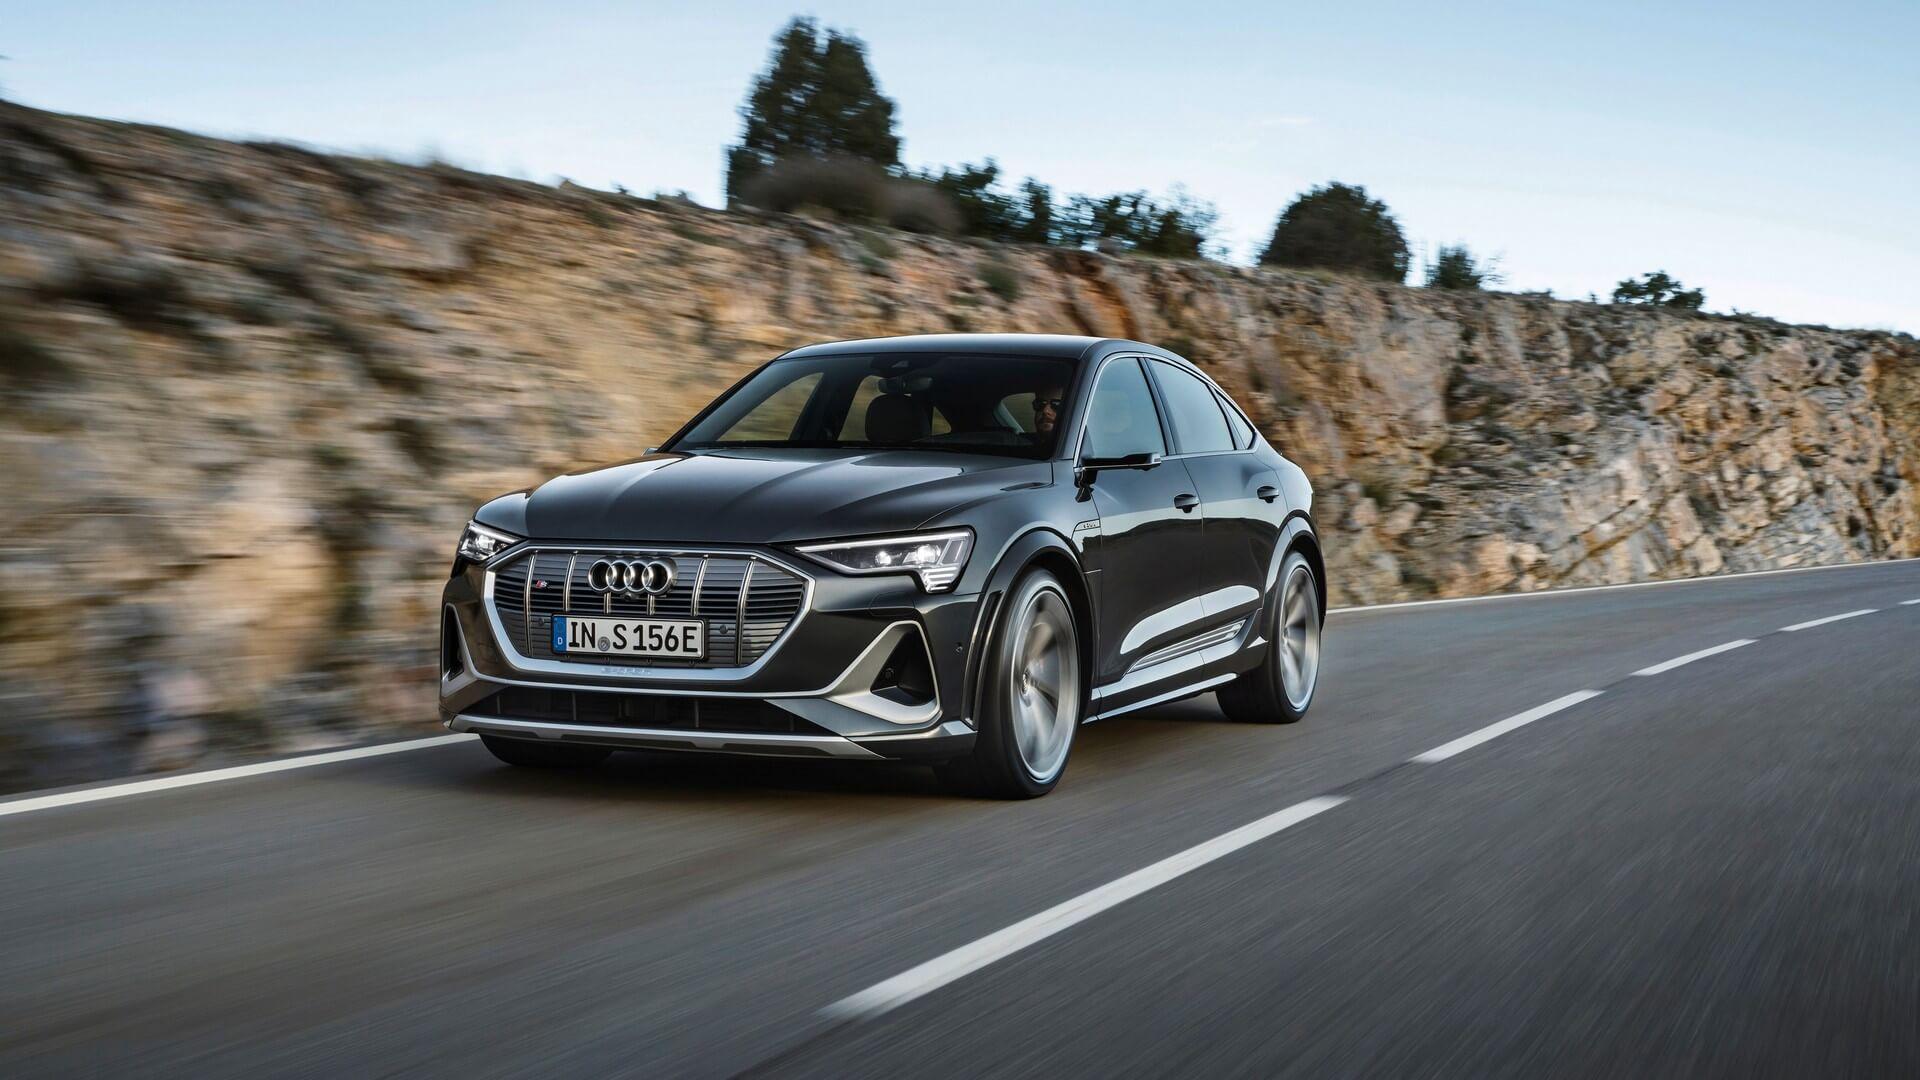 Audi-E-Tron-S-and-E-Tron-S-Sportback-2020-60